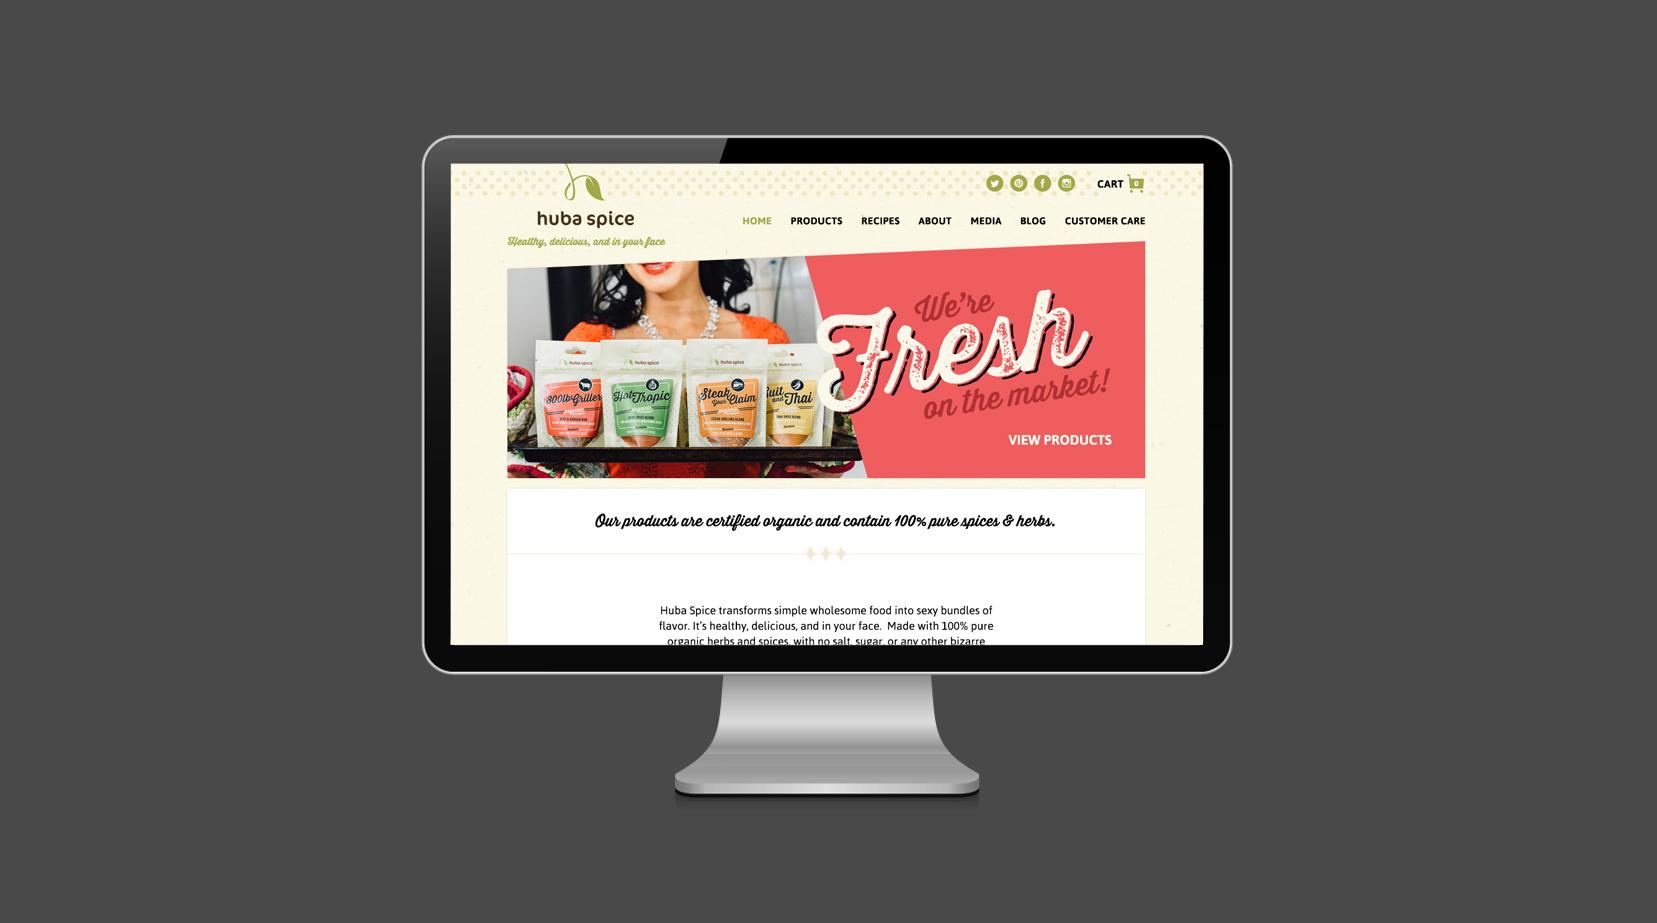 Huba Spice custom website design